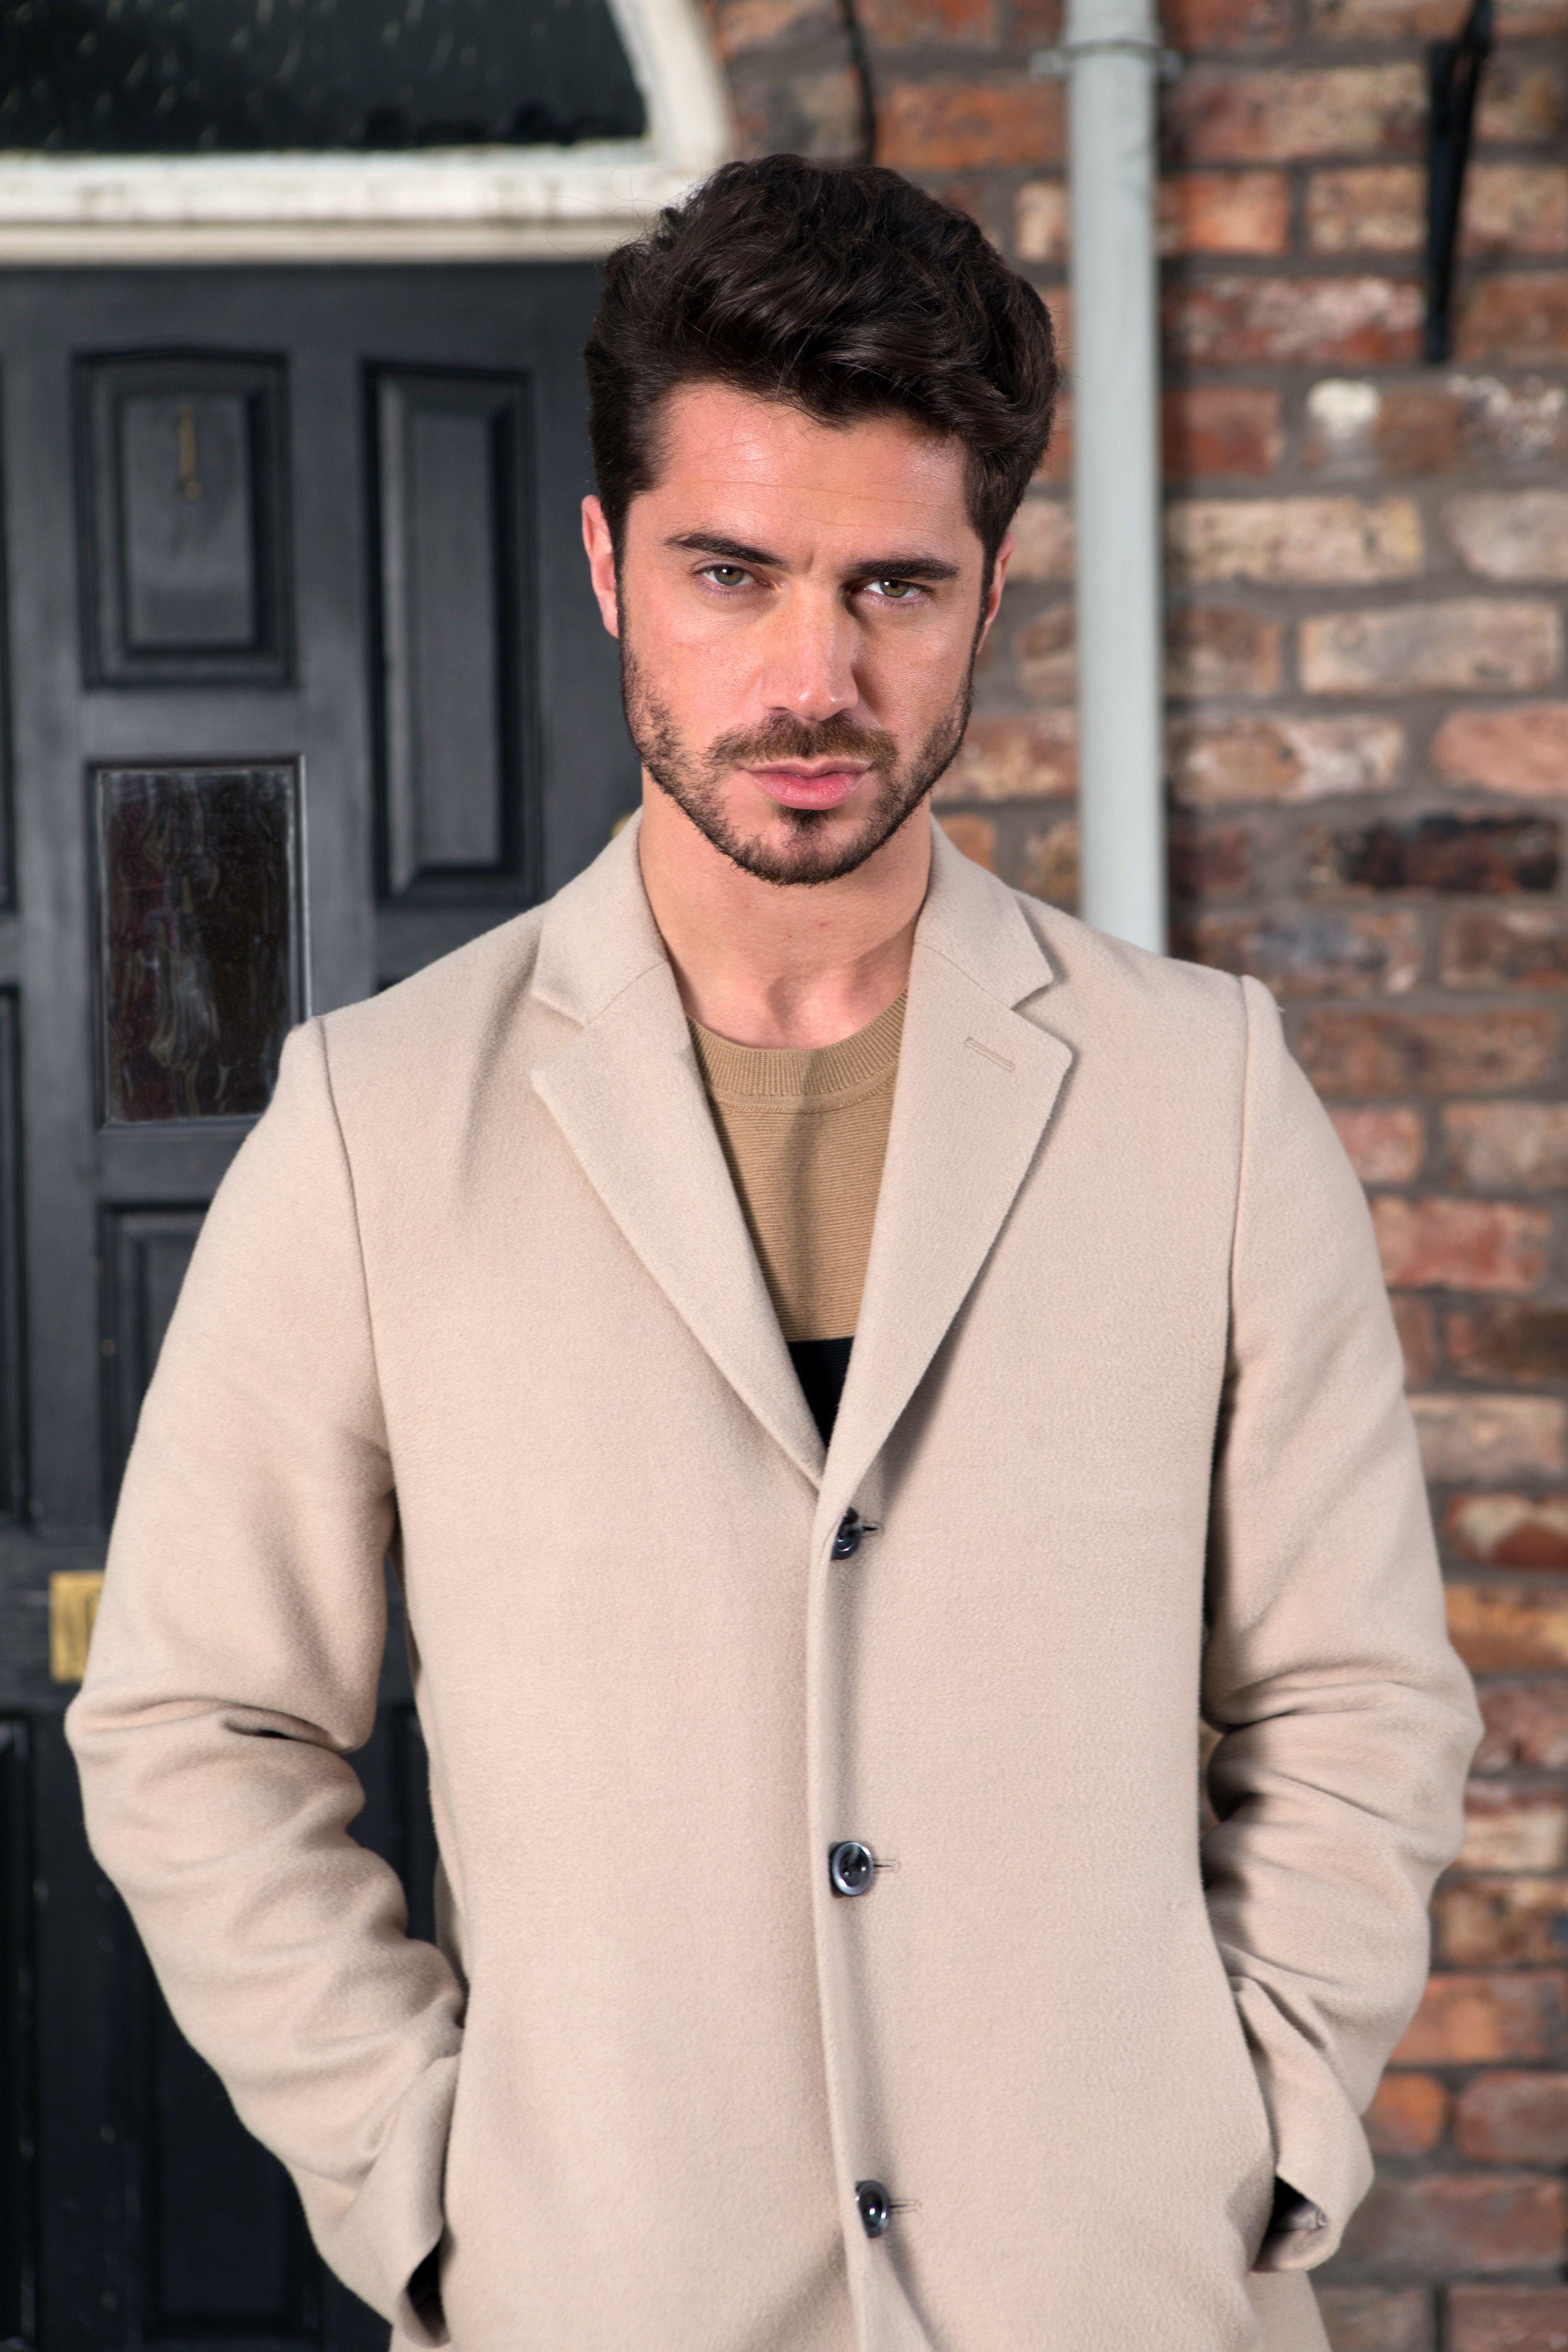 Coronation Street: who is Adam Barlow?